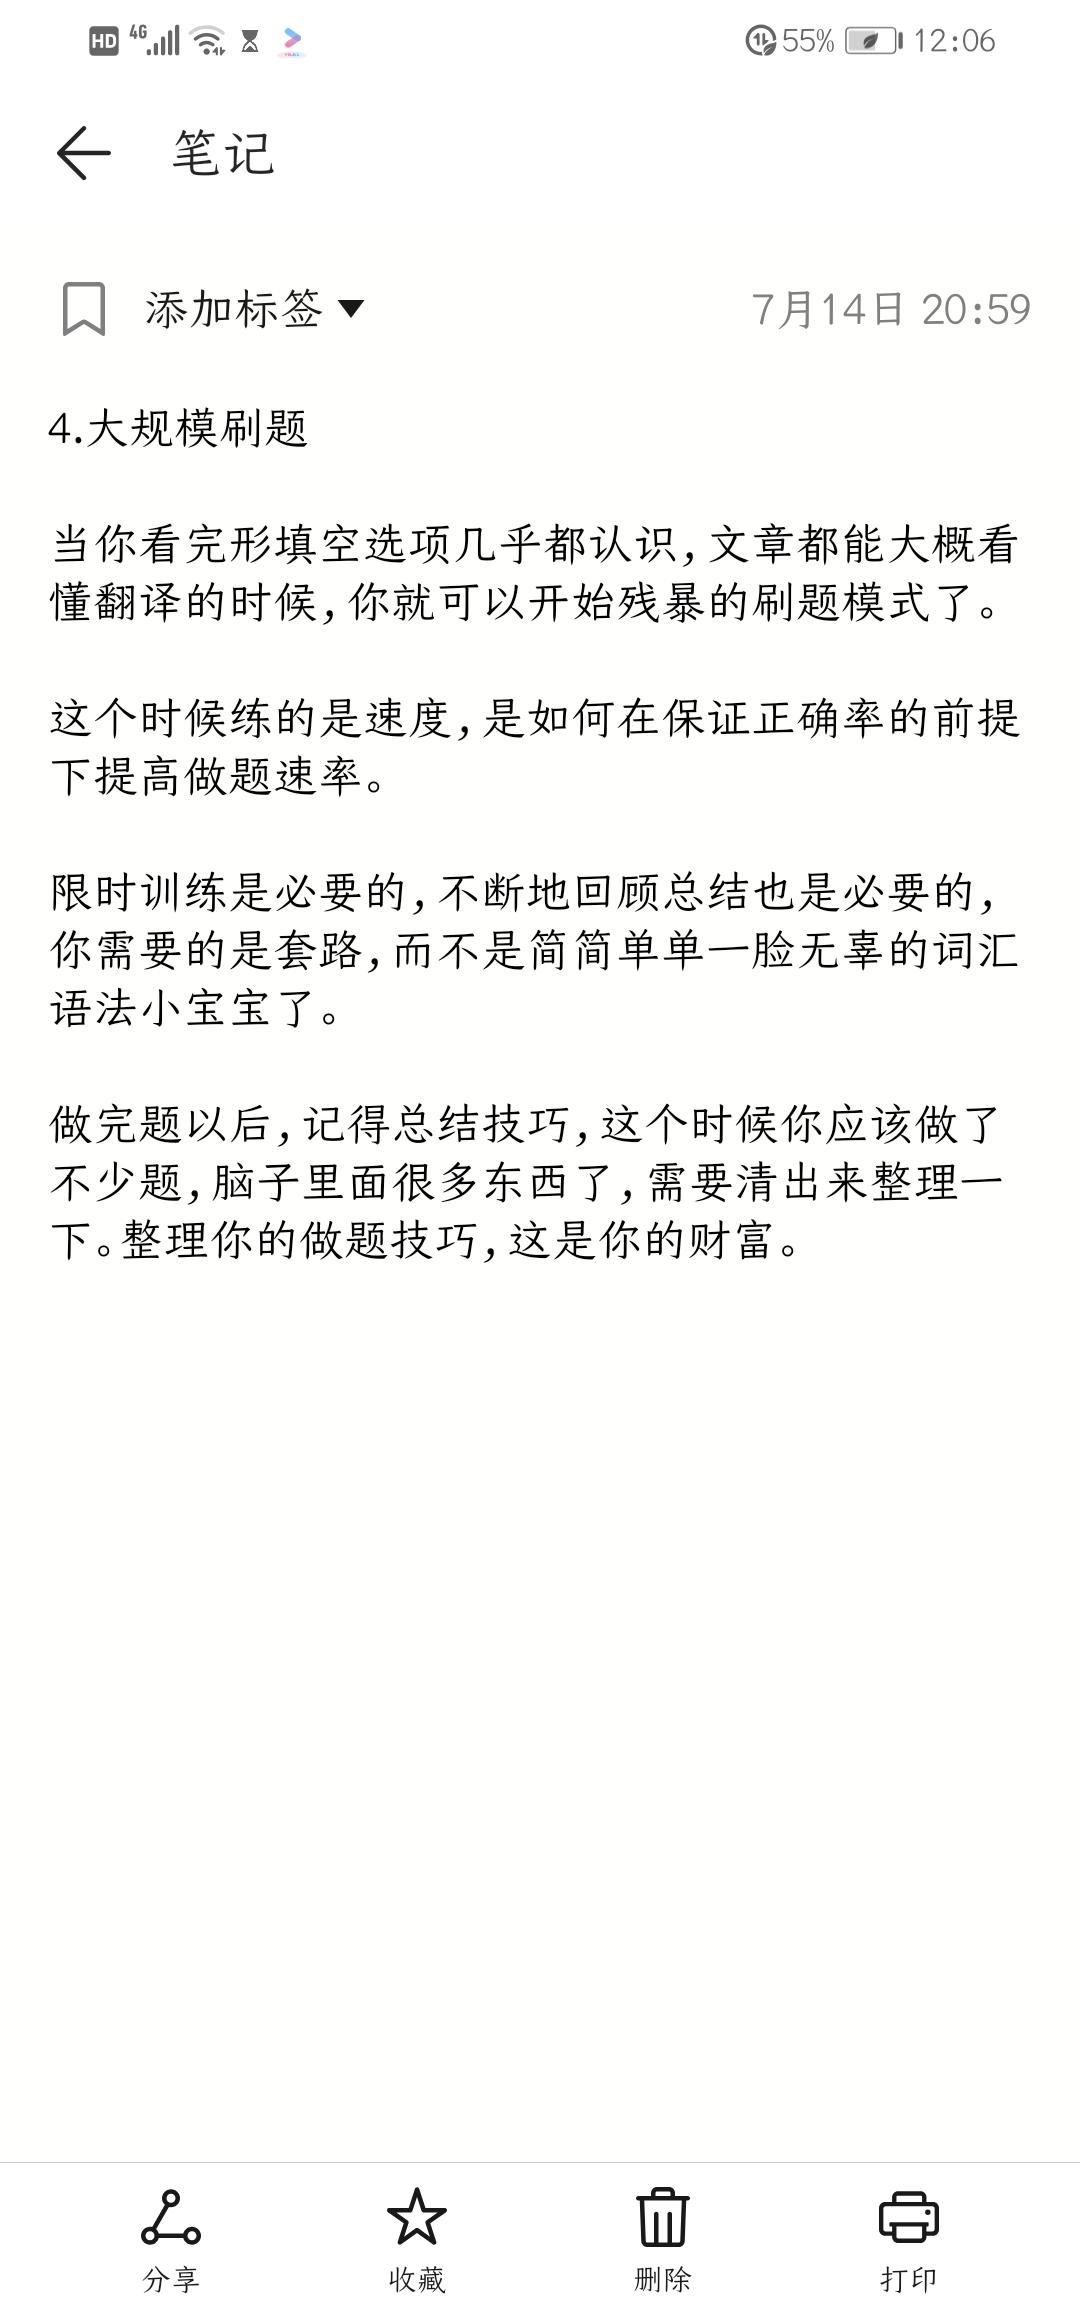 Screenshot_20190715_120634_com.example.android.notepad.jpg